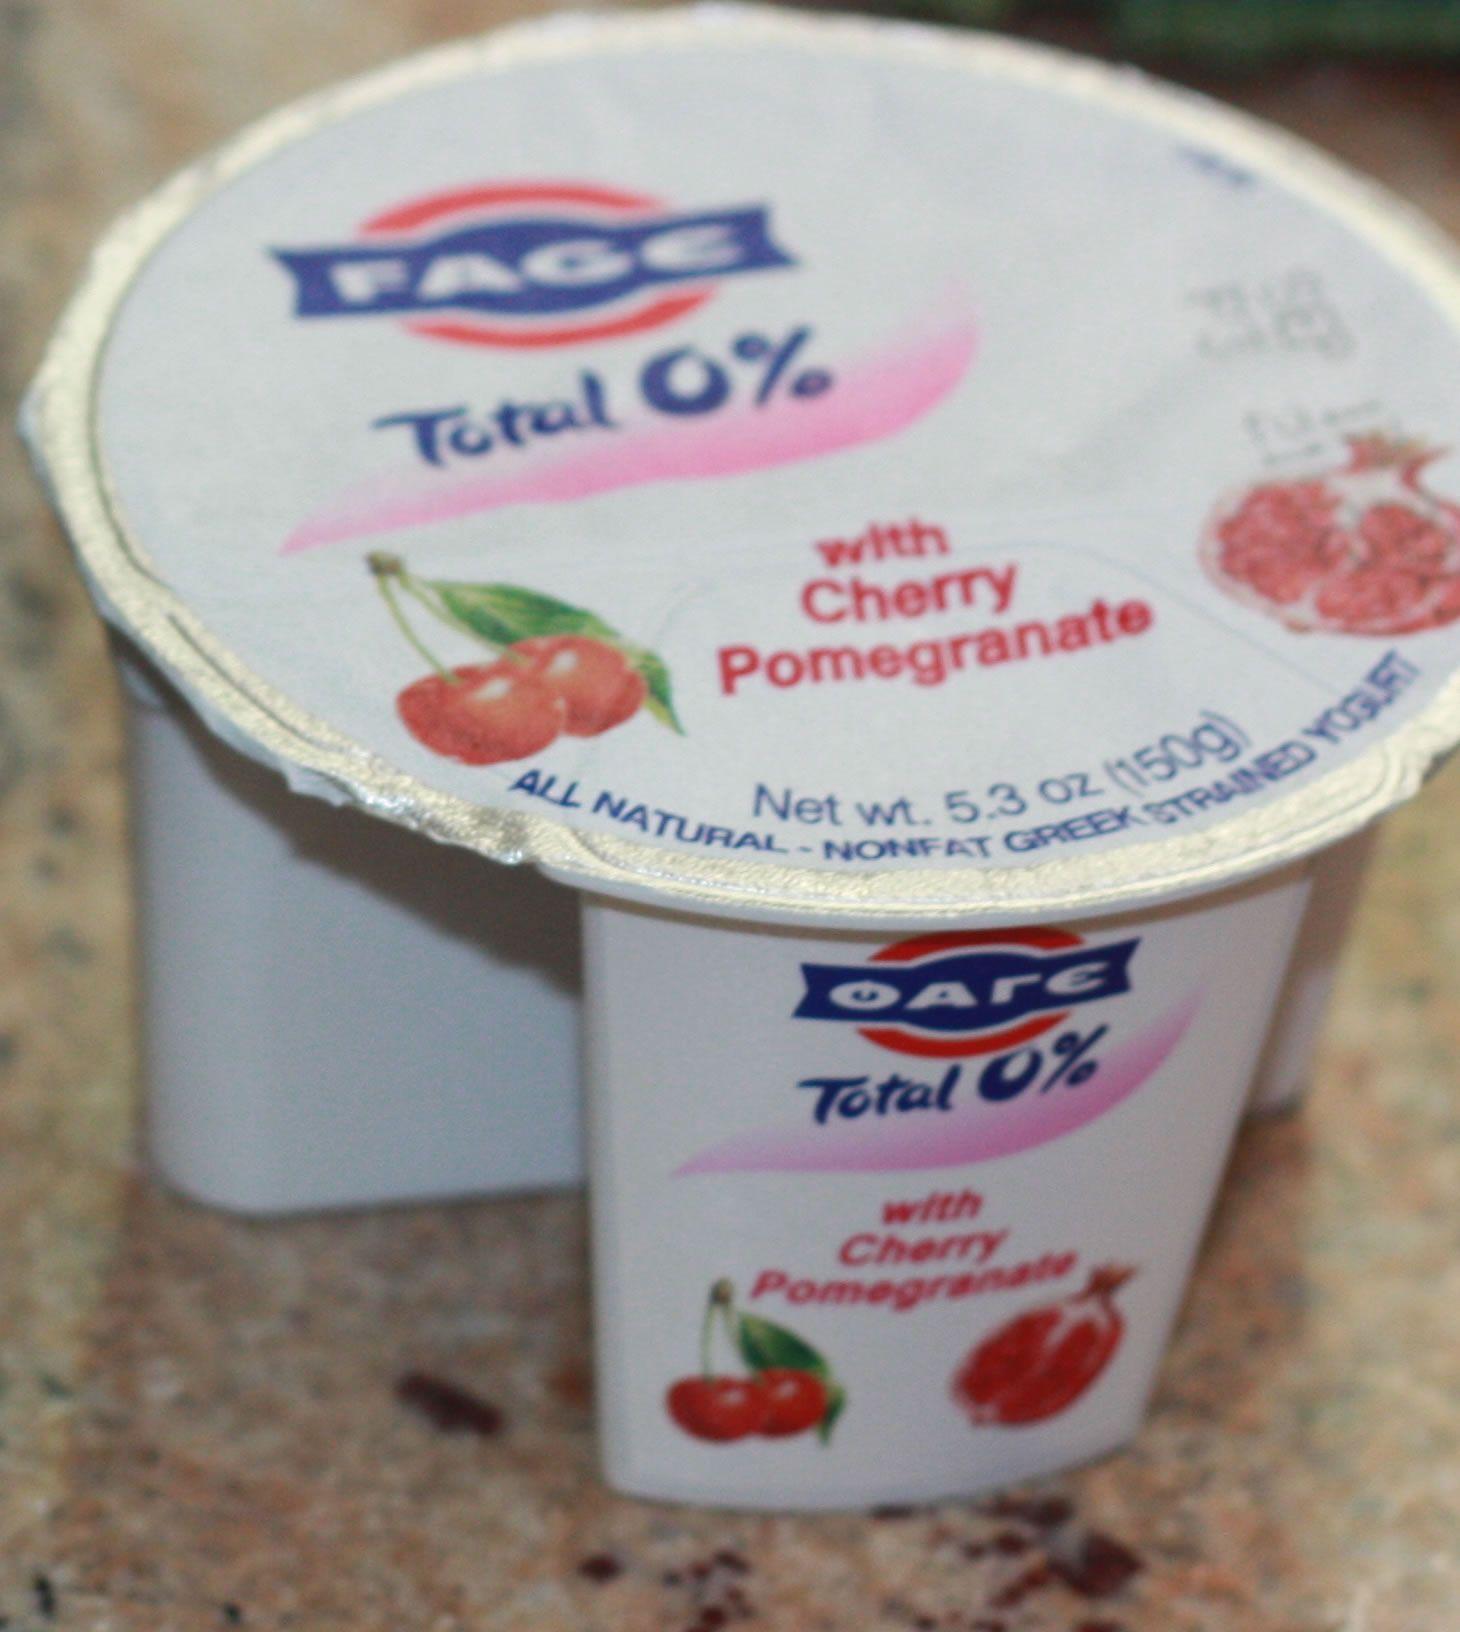 Fage Cherry Pomegranate Greek Yogurt